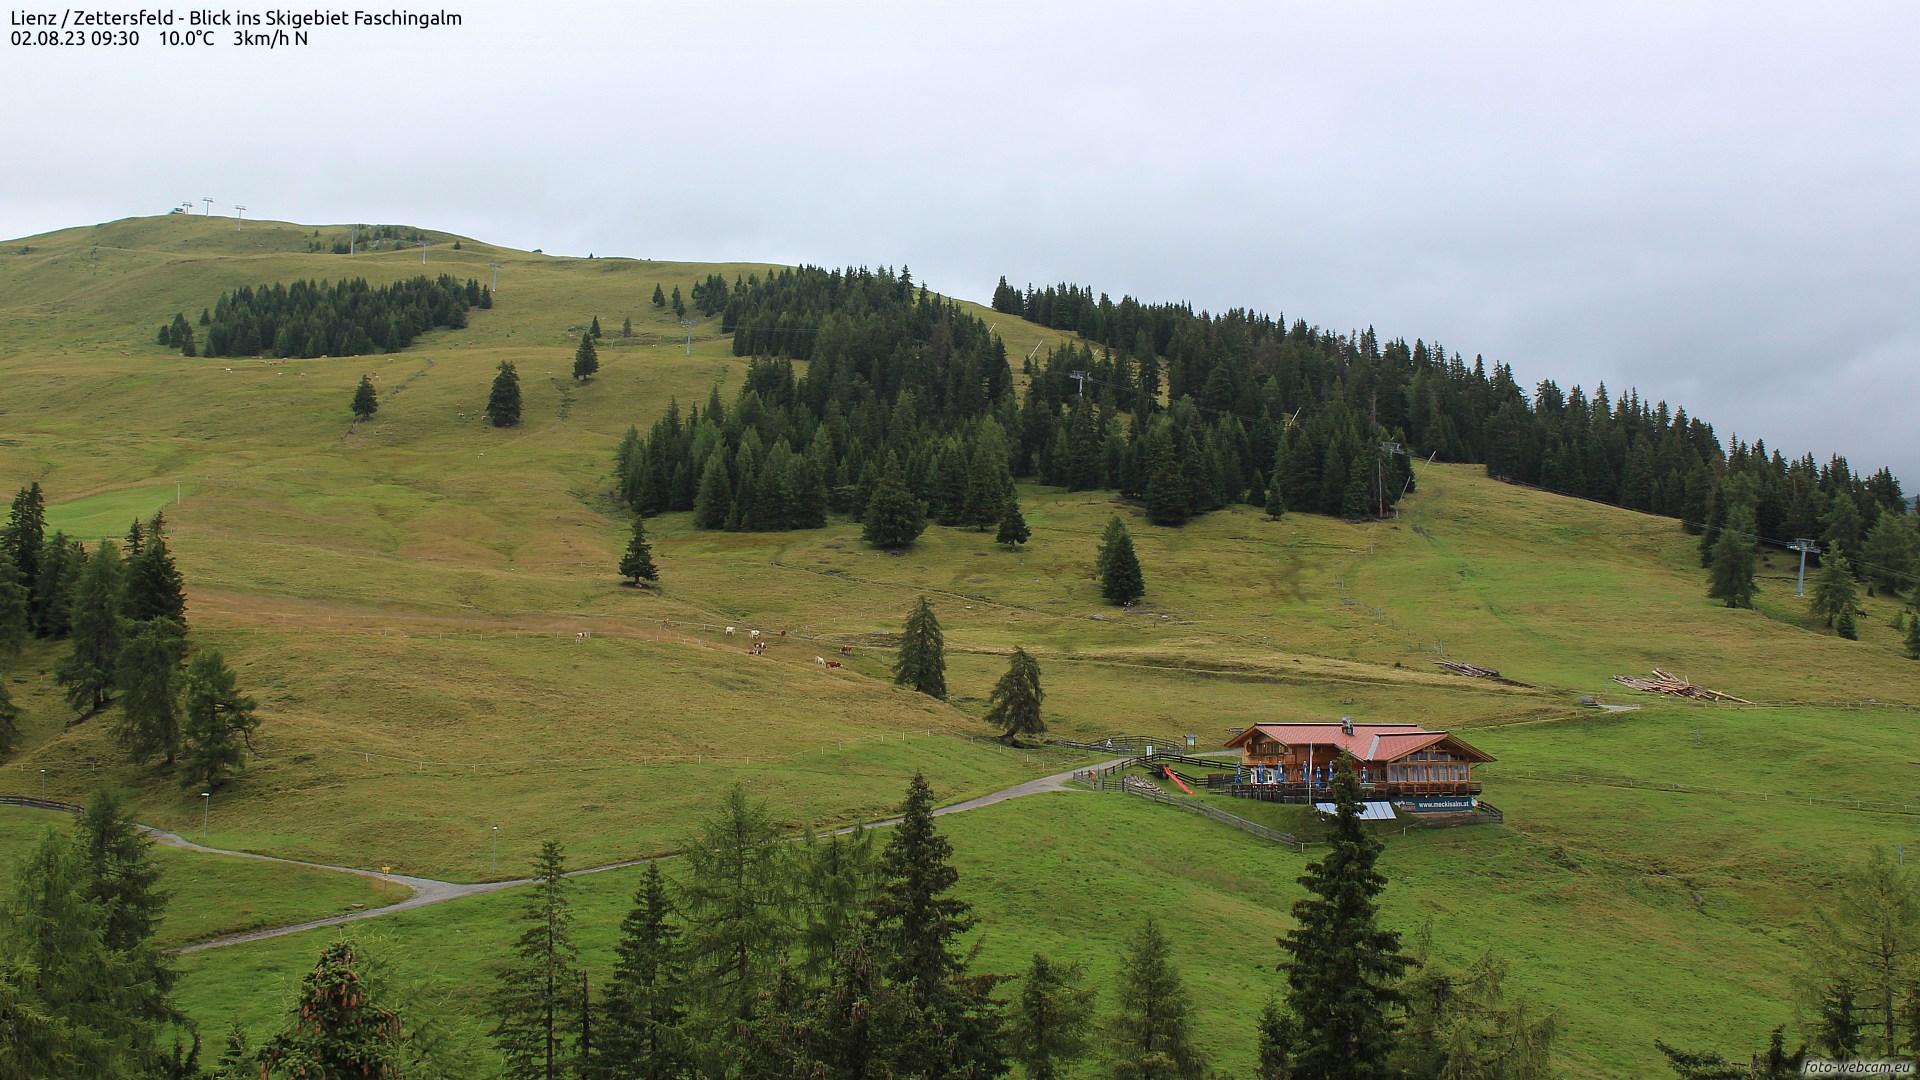 Webcam Lienz / Zettersfeld, Blick ins Skigebiet Faschingalm | © www.foto-webcam.eu